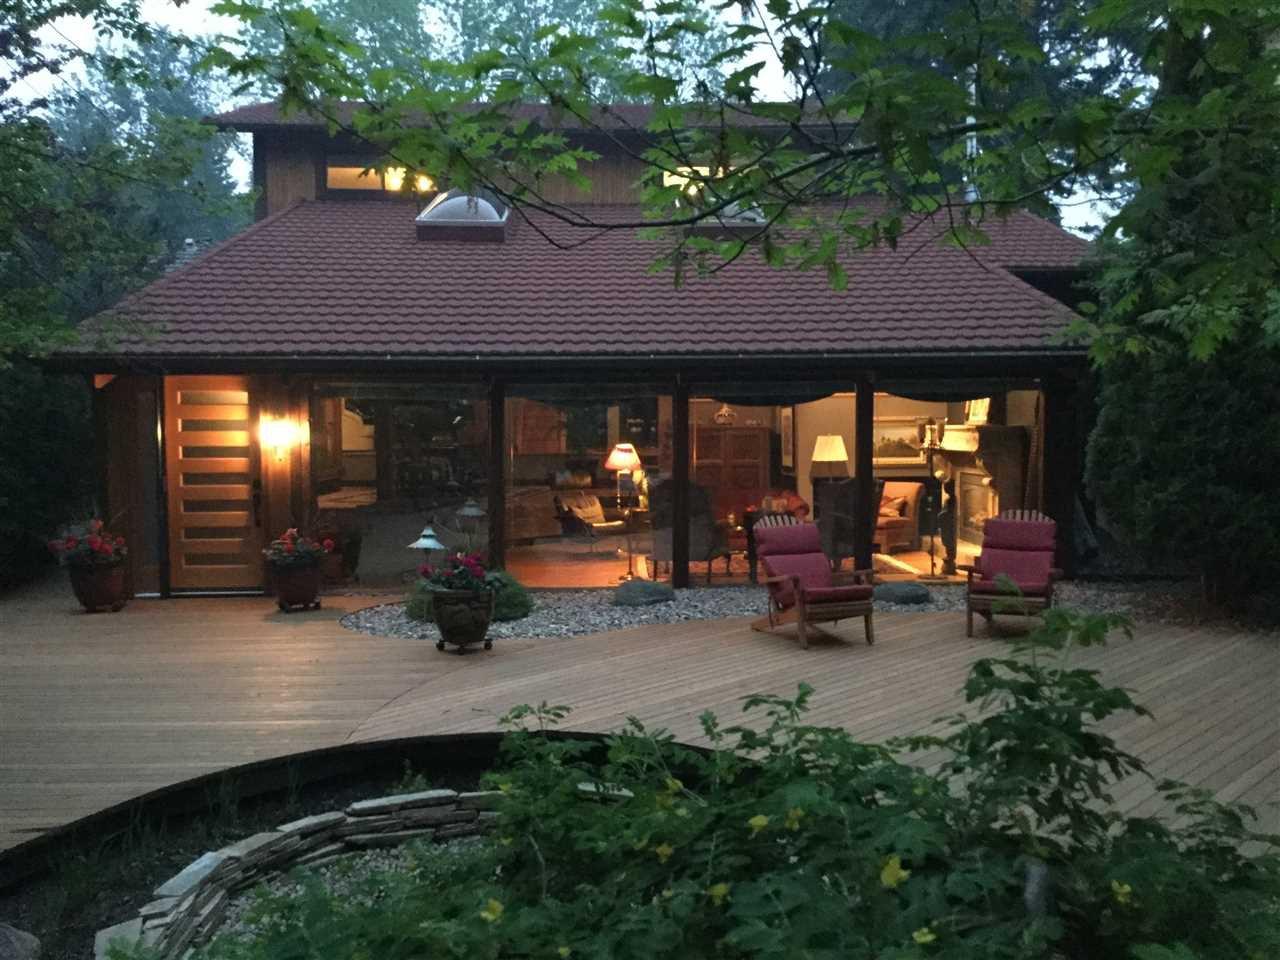 Main Photo: 14228 RAVINE Drive in Edmonton: Zone 21 House for sale : MLS®# E4188018